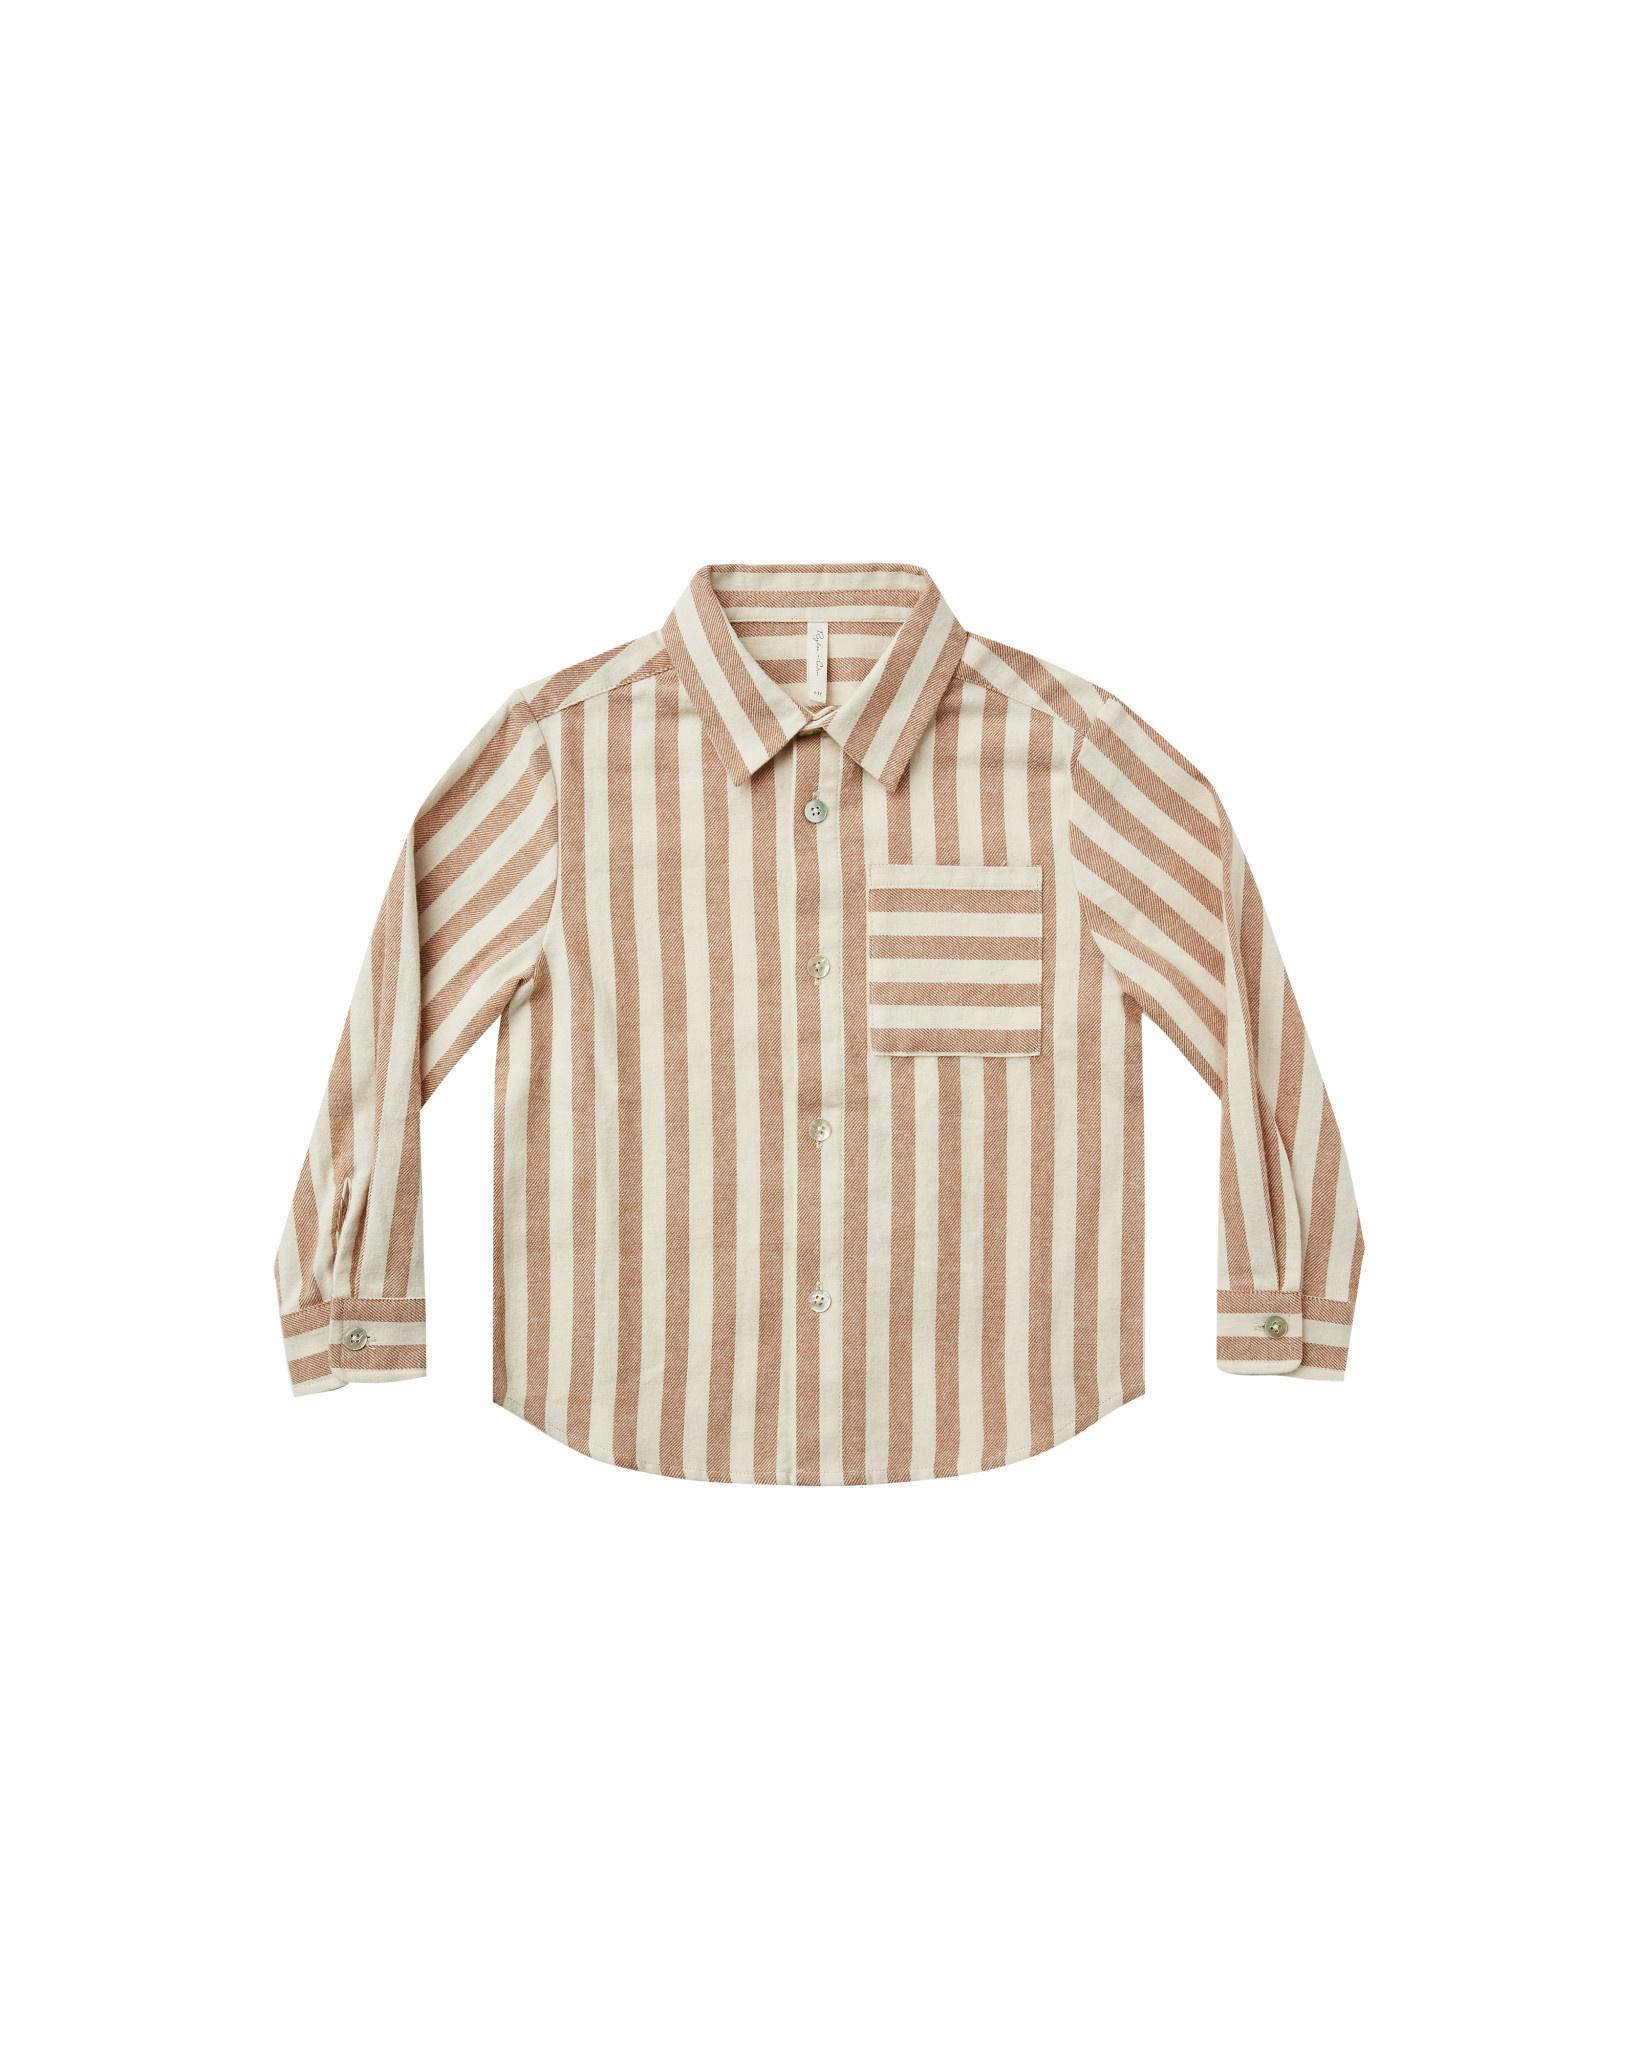 RYLEE AND CRU Retro Stripe Collared Shirt